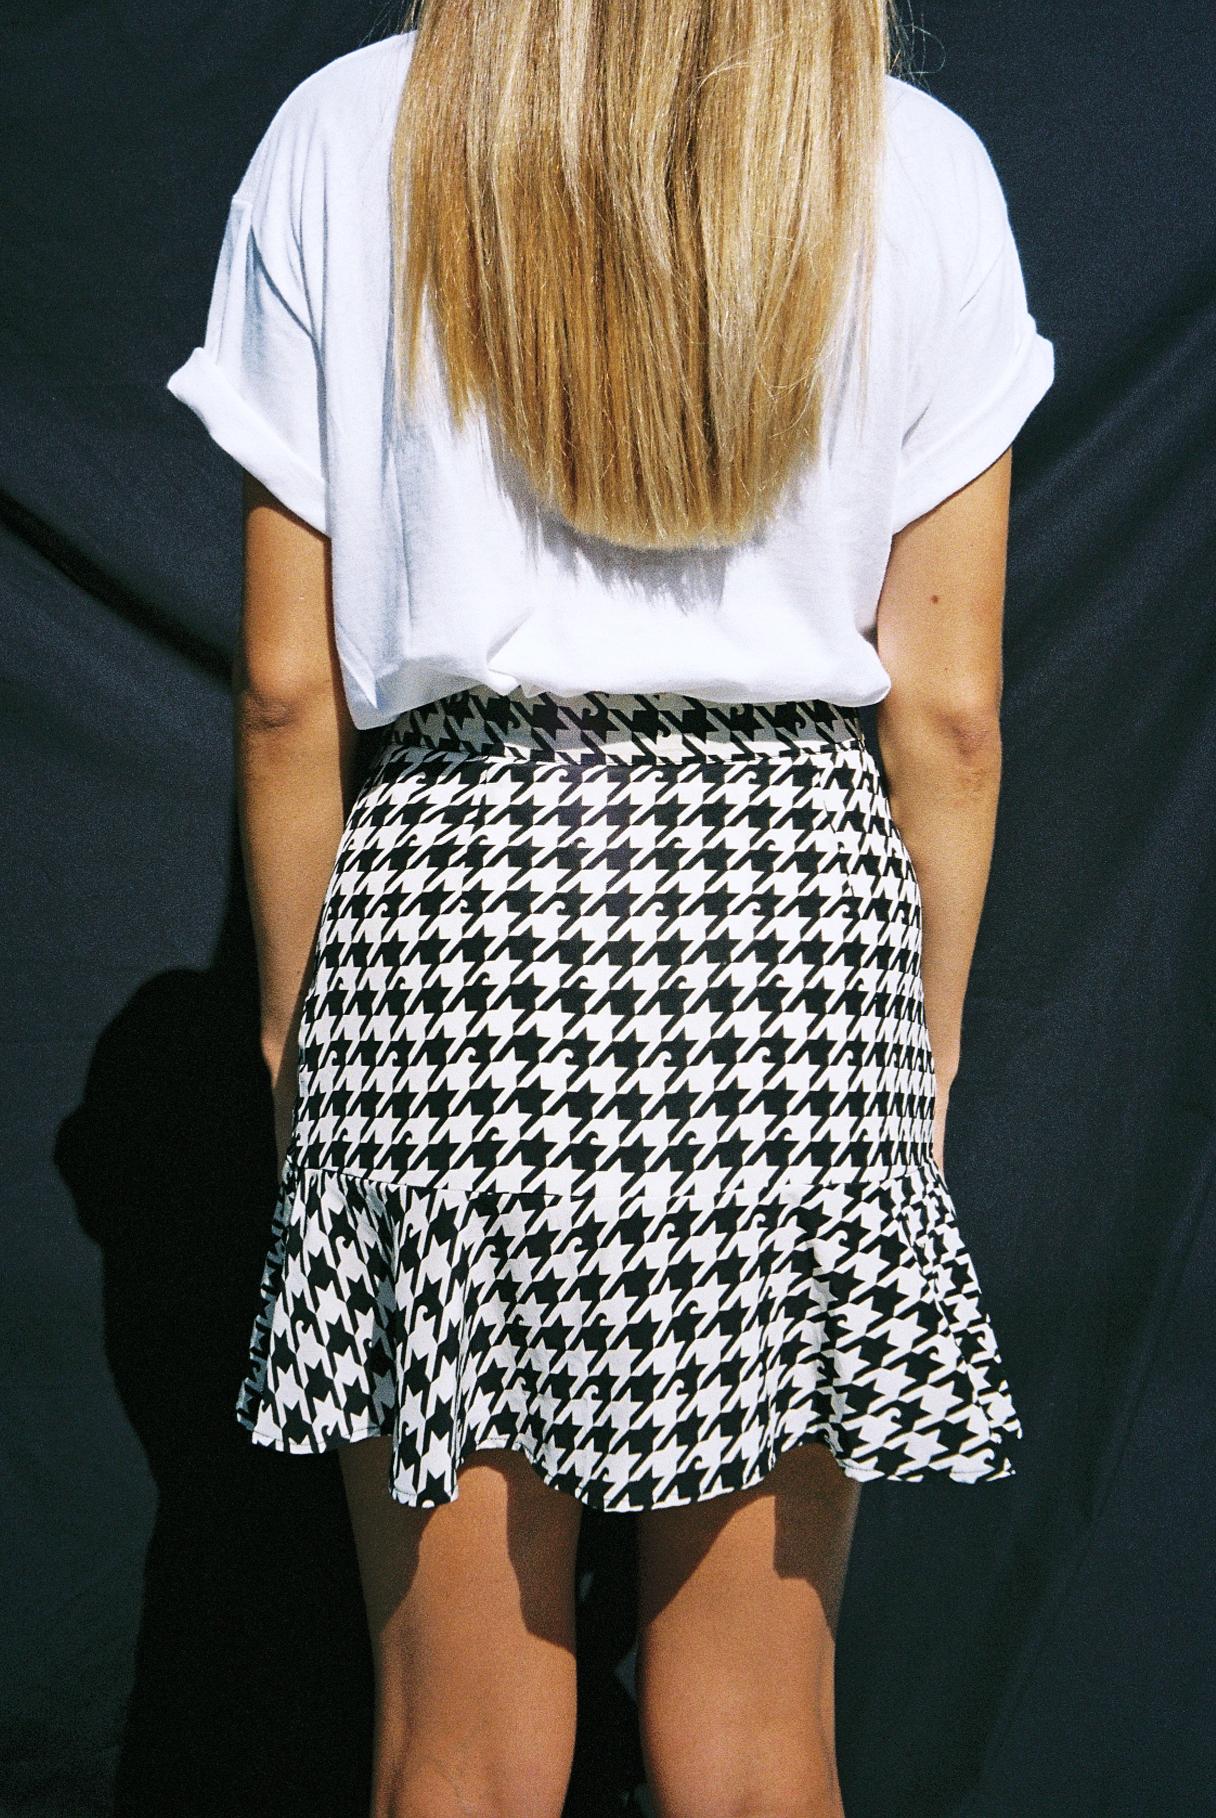 sharktooth skirt 3.jpg